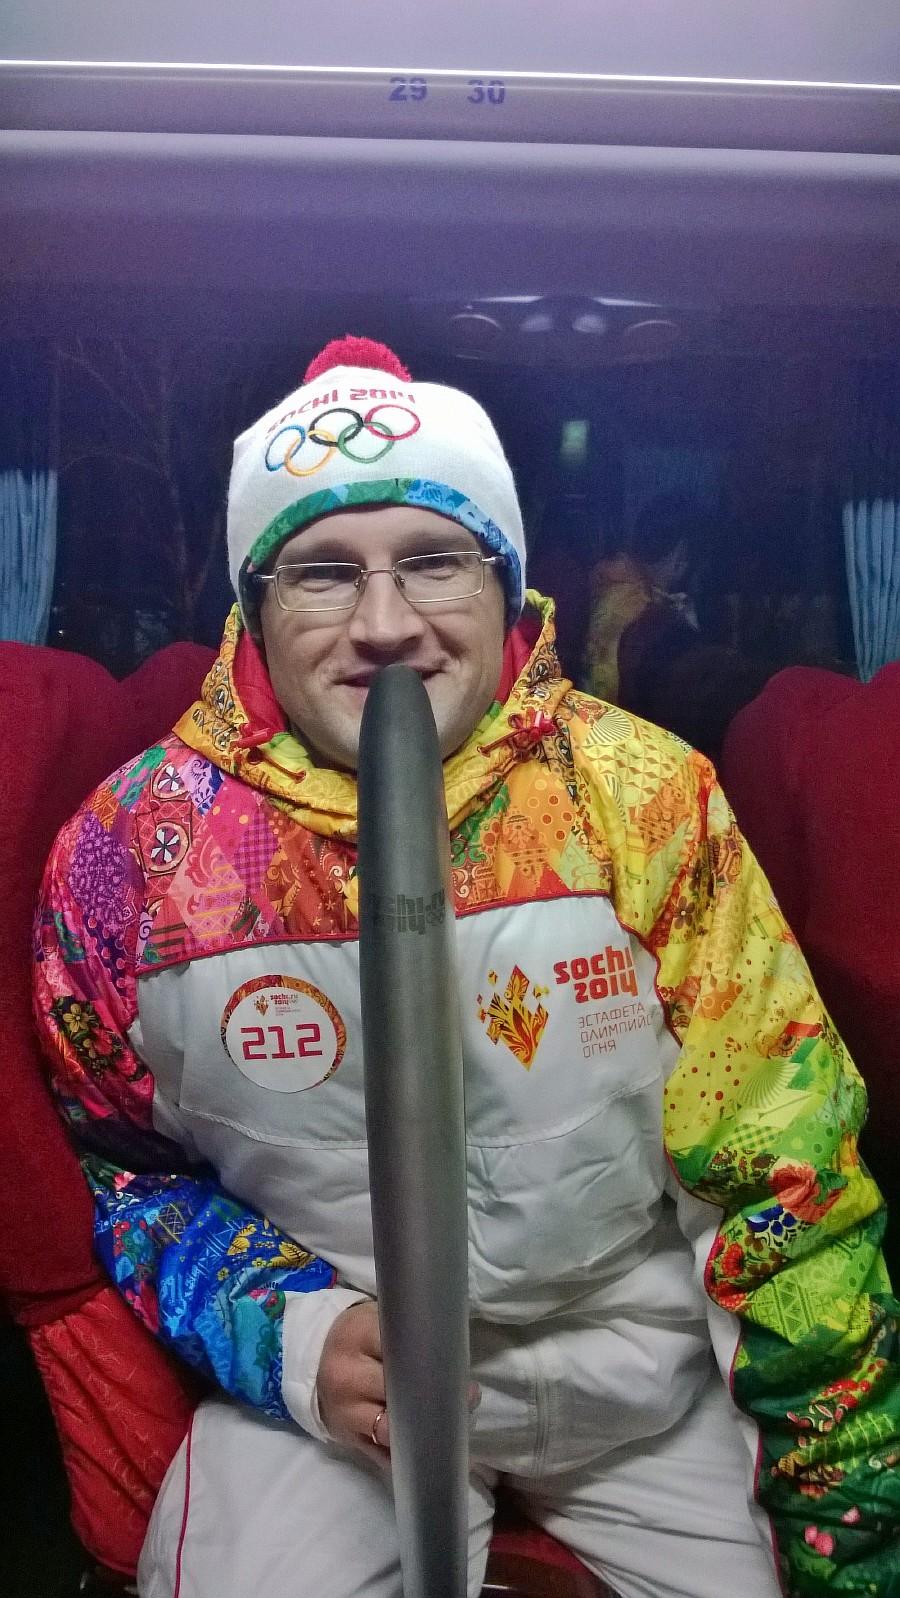 Resize of WP_20131203_040, Олимпийский огонь, Аксанов Нияз, блогеры, kukmor, путешествия, фотография, sochi2014, Сочи2014, олимпиада,  Эстафета Олимпийского огня, Барнаул, Алтайский край